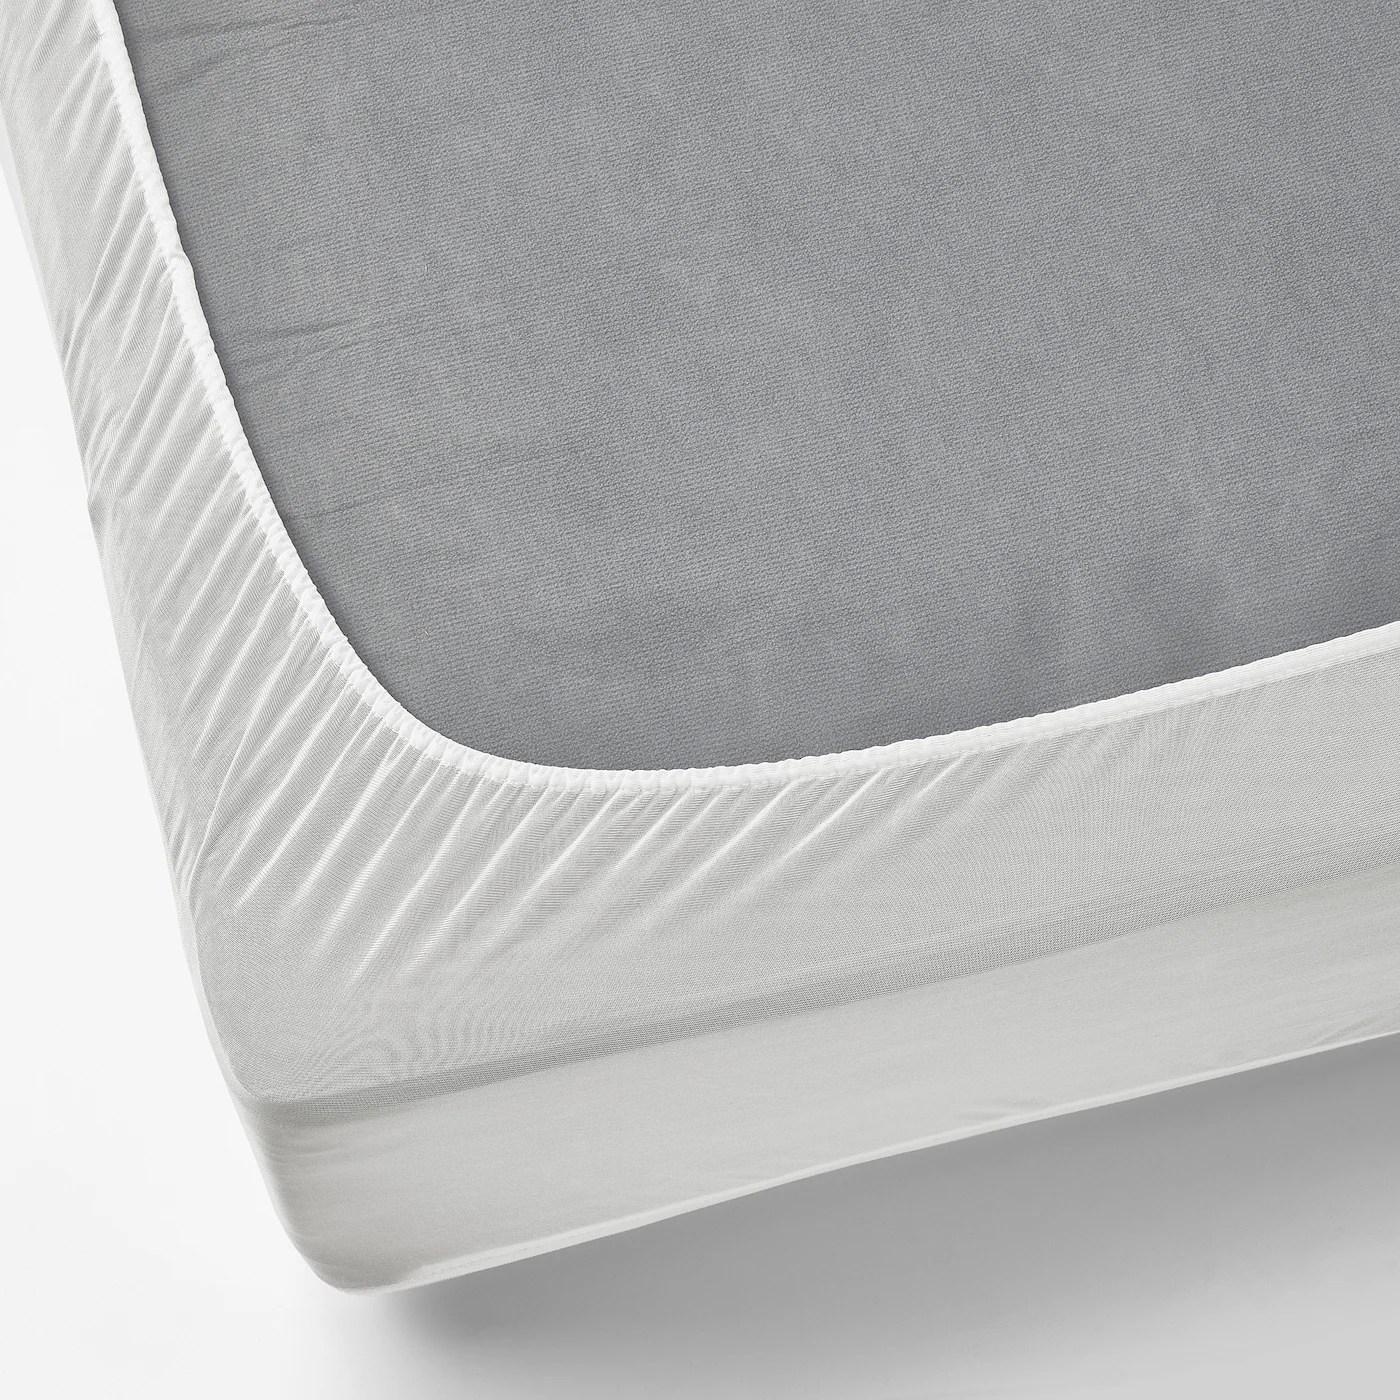 Grusnarv Protection Matelas Etanche 140x200 Cm Ikea Suisse